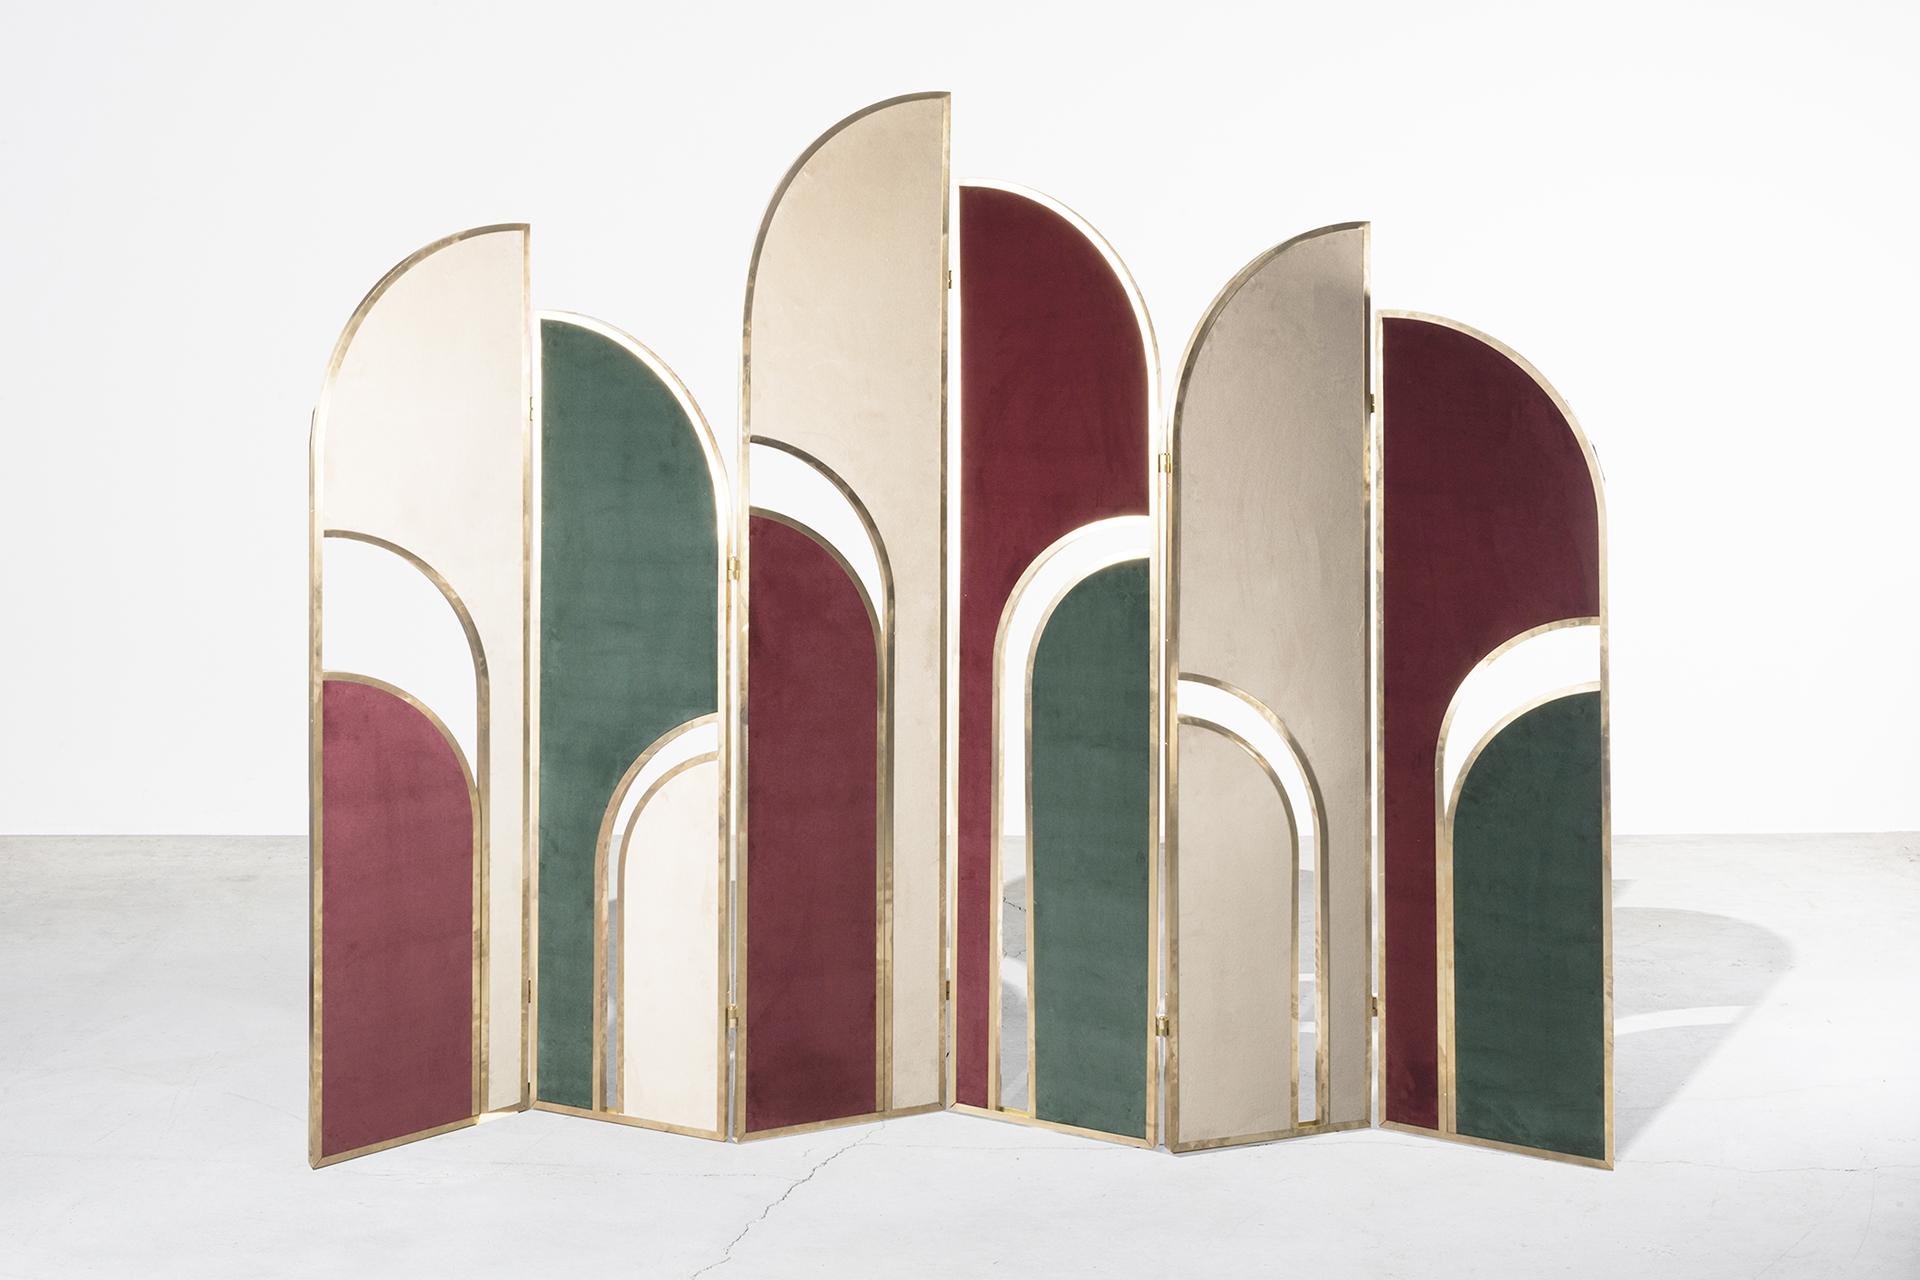 Nilufar иChristie's: 100 предметов на аукционе дизайна